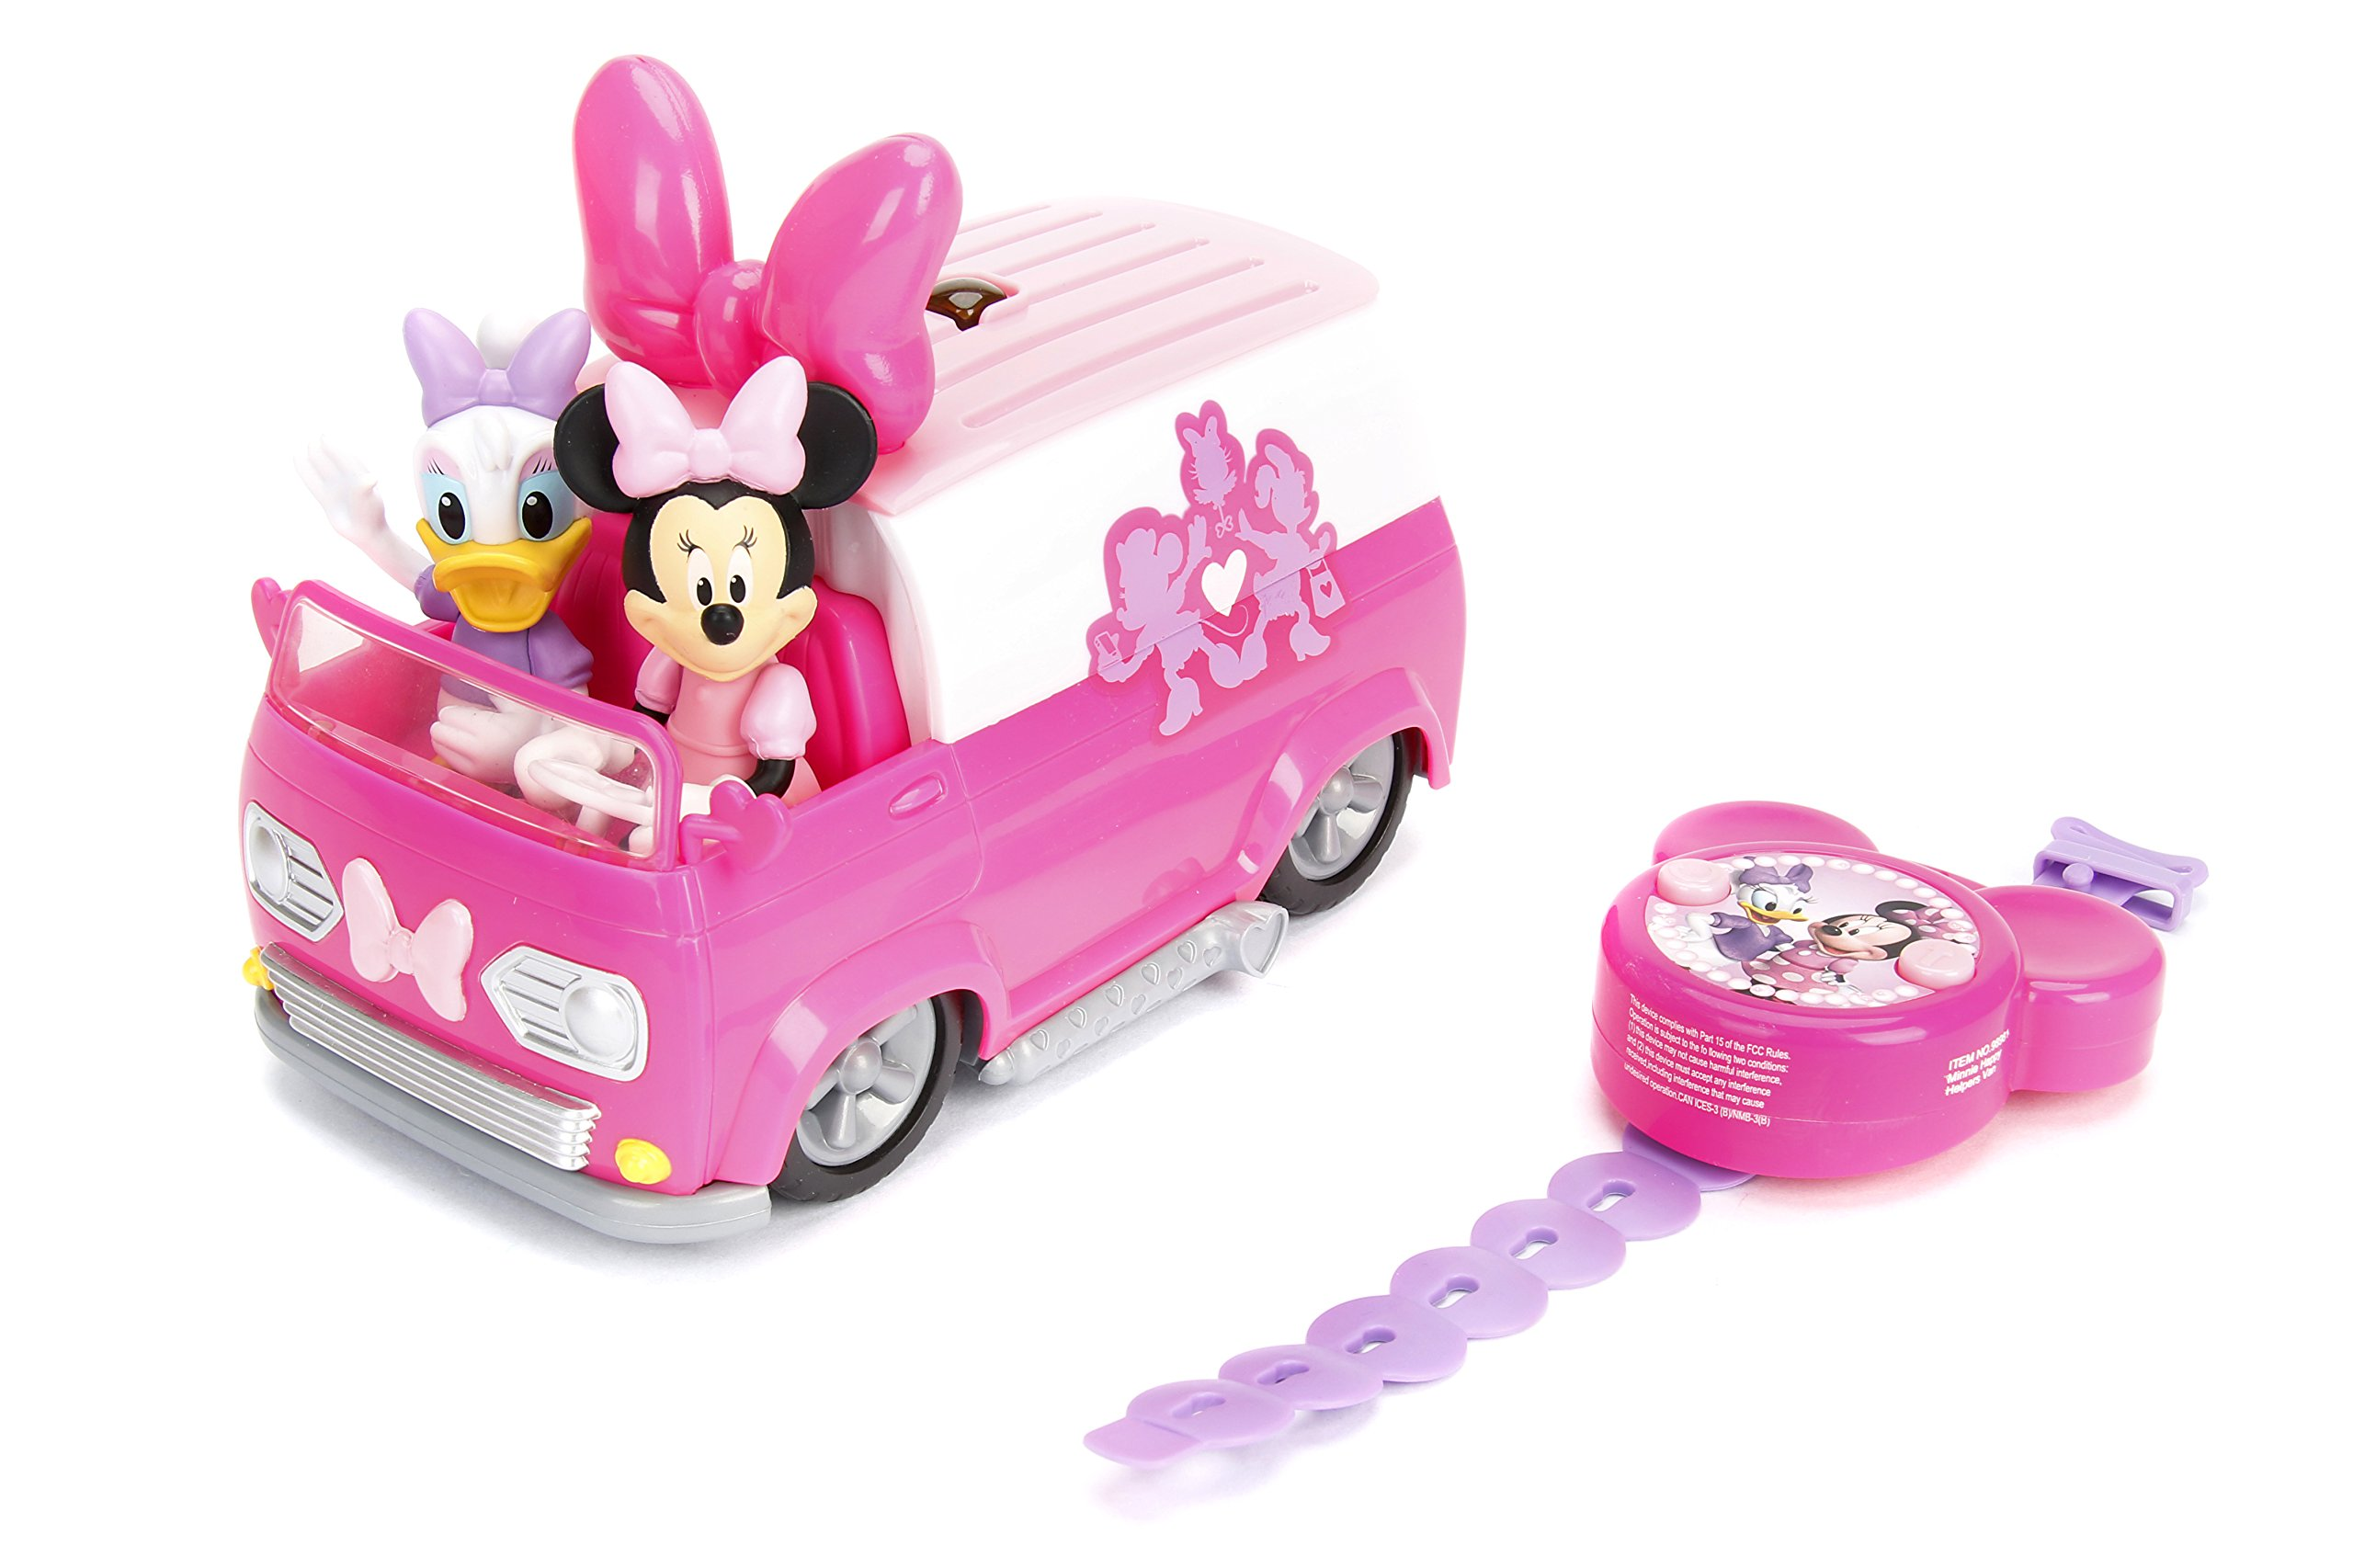 Jada Toys Disney Junior Minnie Mouse Happy Helper's Van RC/Radio Control Toy Vehicle, Pink/White